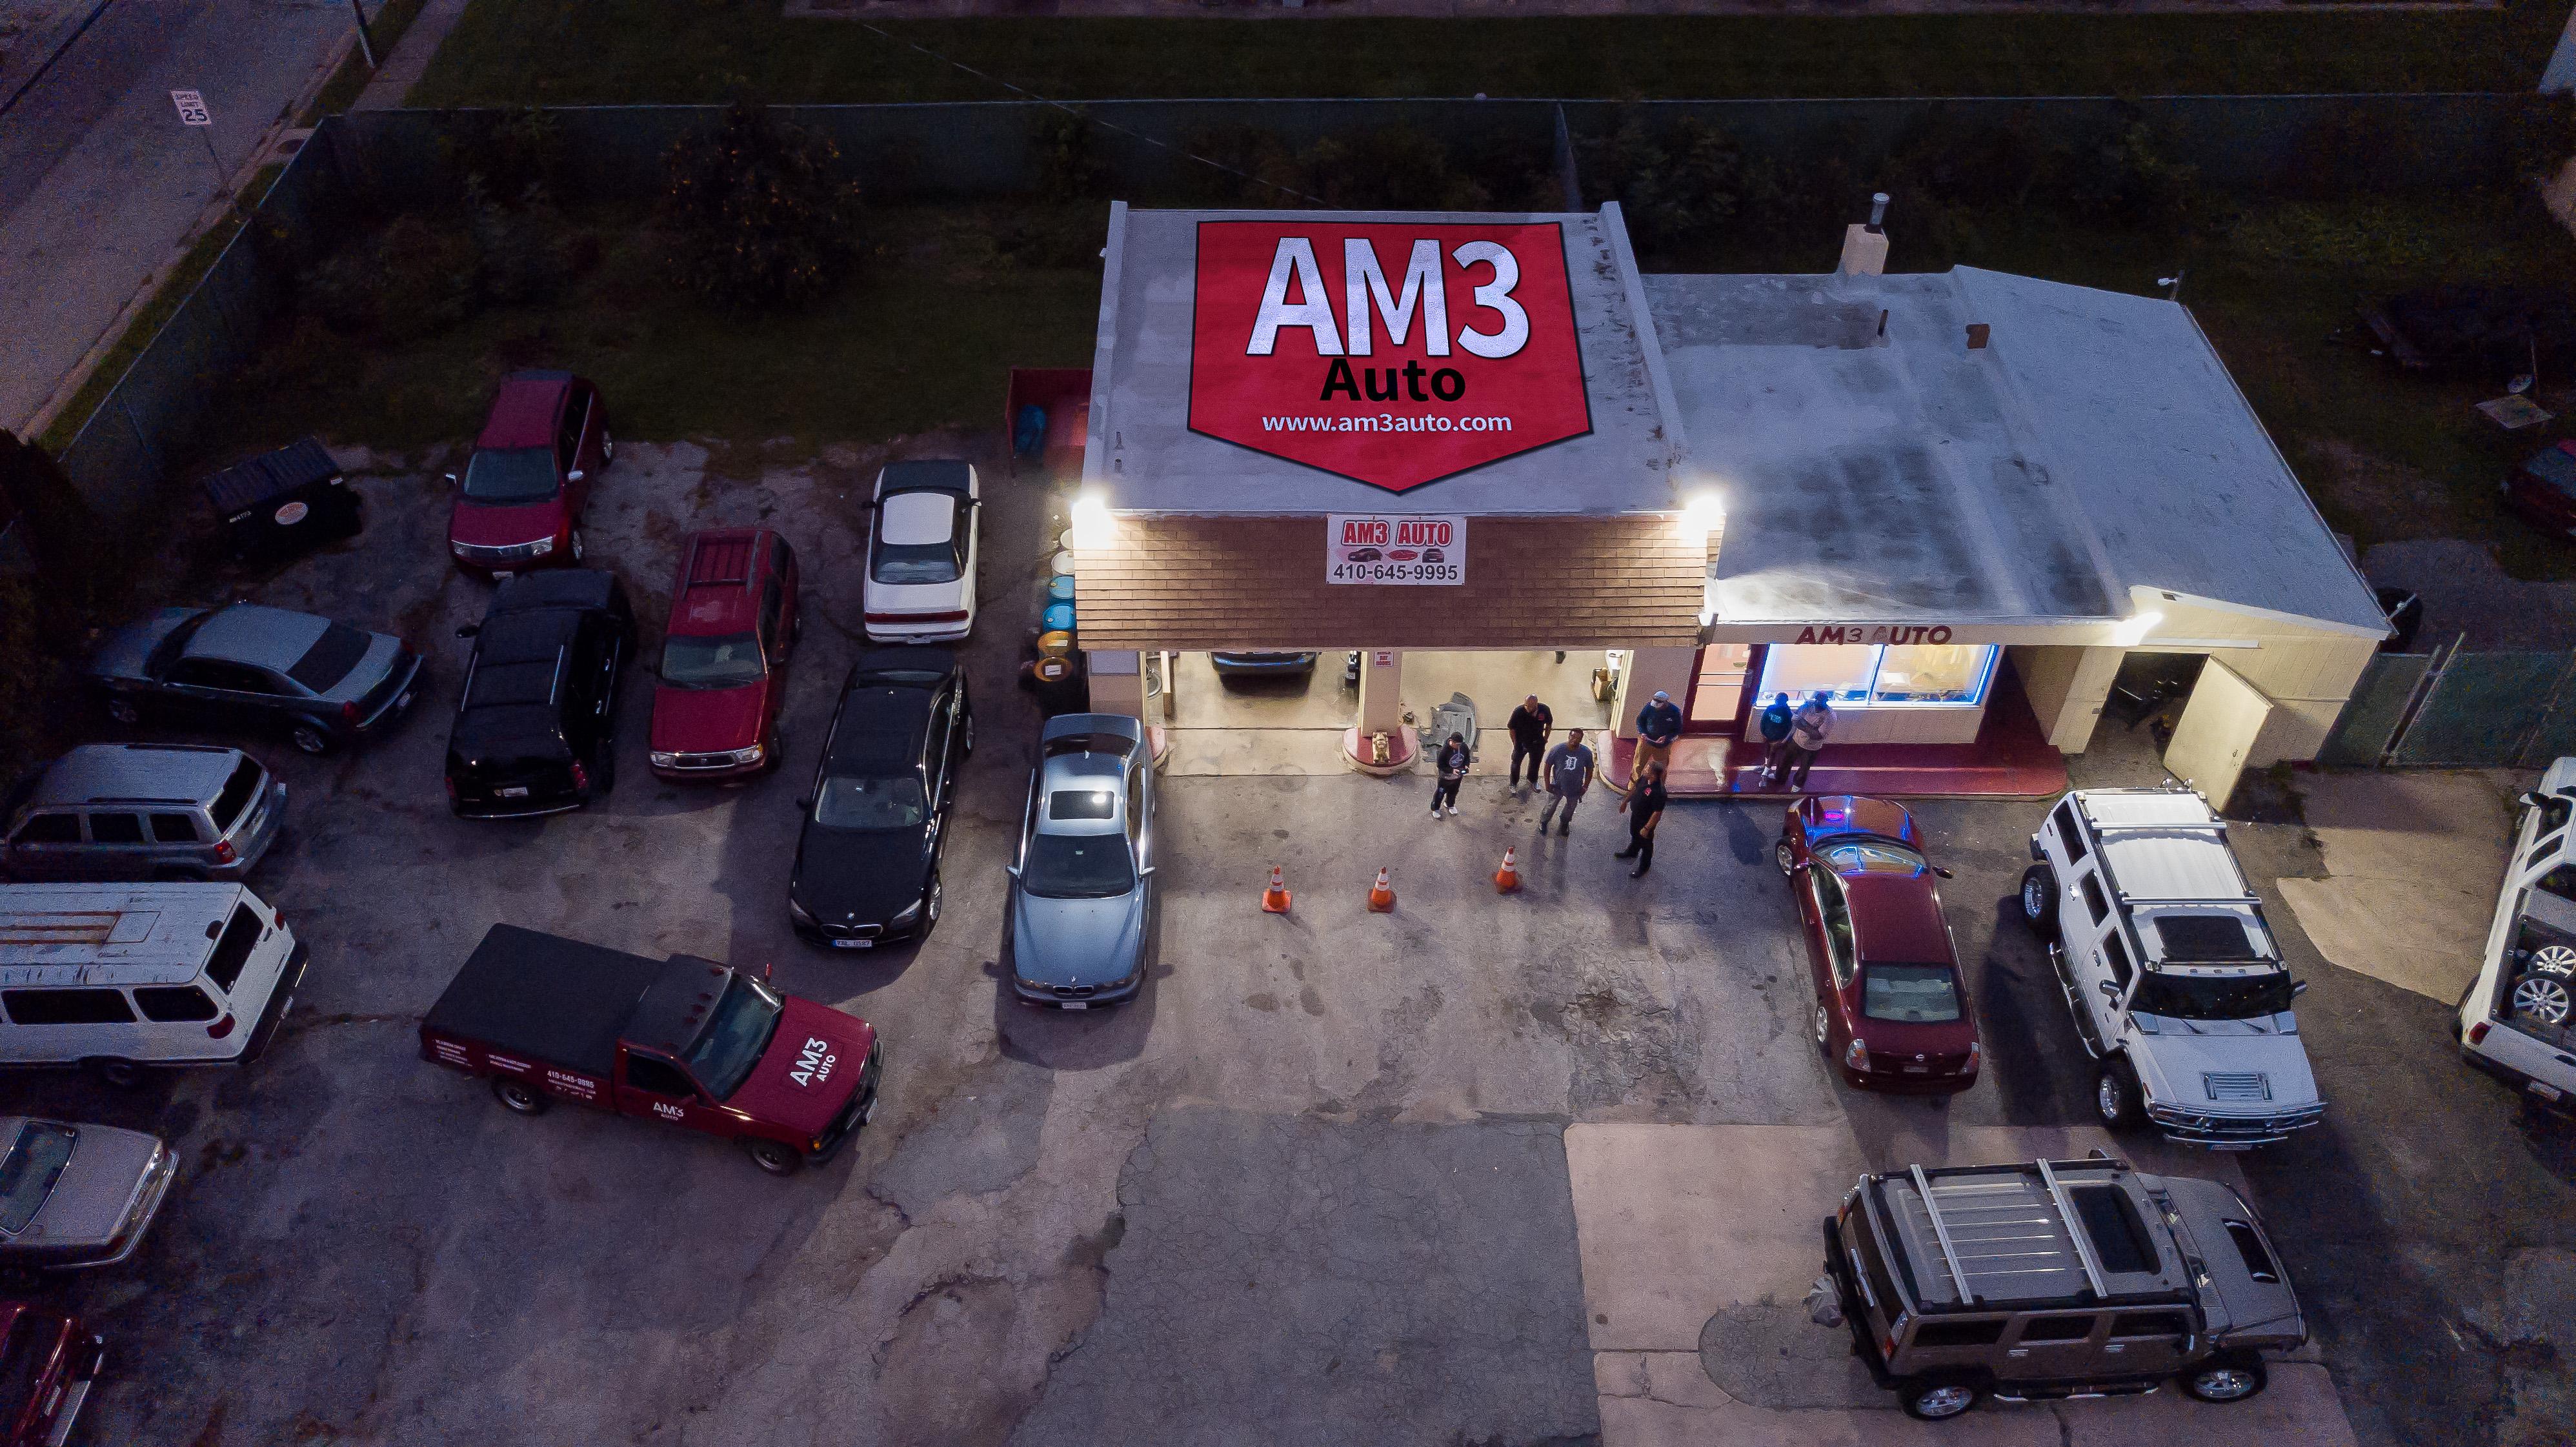 AM3 Auto